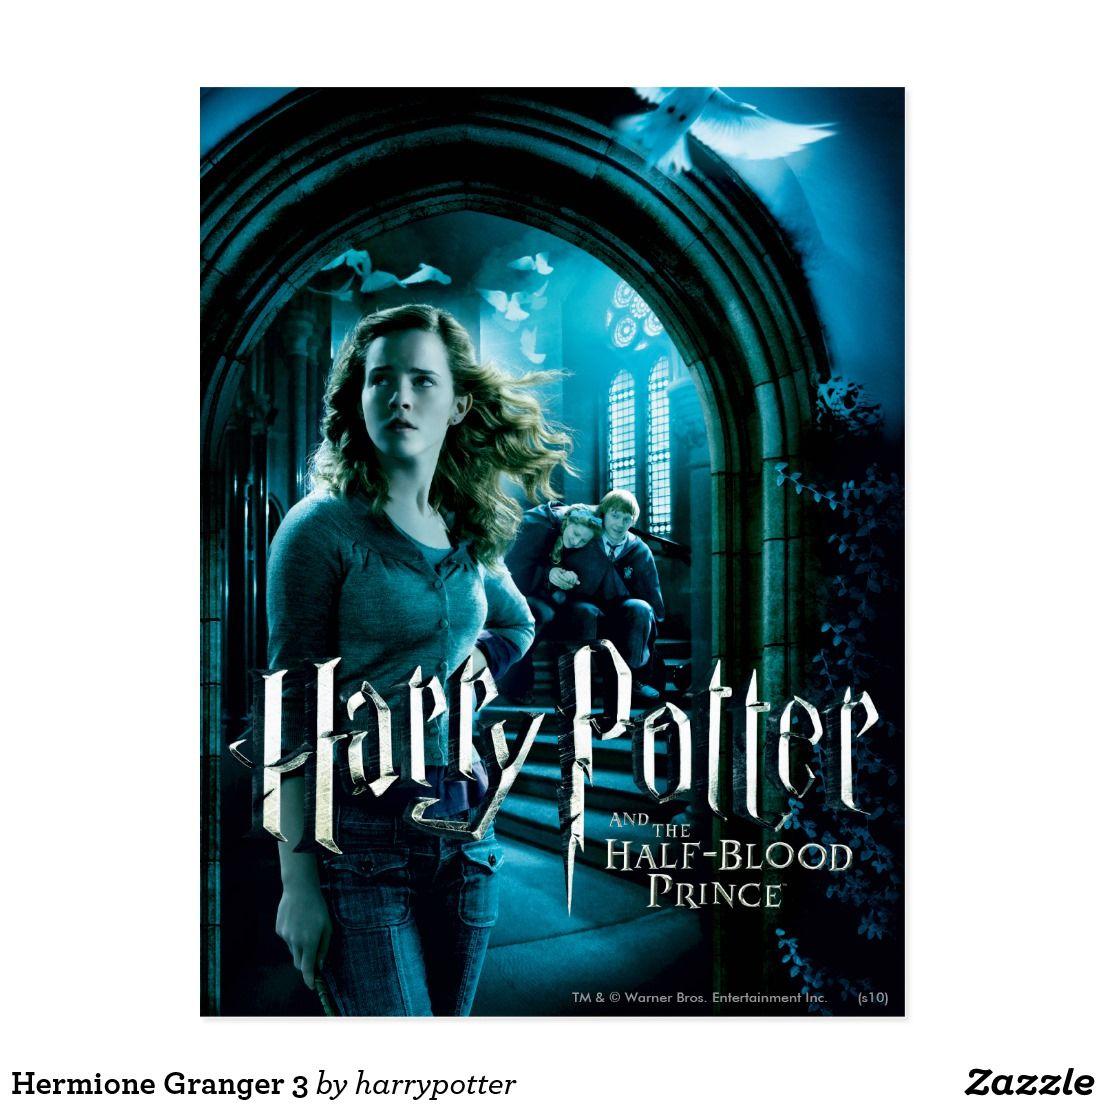 Hermione Granger 3 Postcard Zazzle Com In 2020 Harry Potter Movie Posters Harry Potter Movies Harry Potter